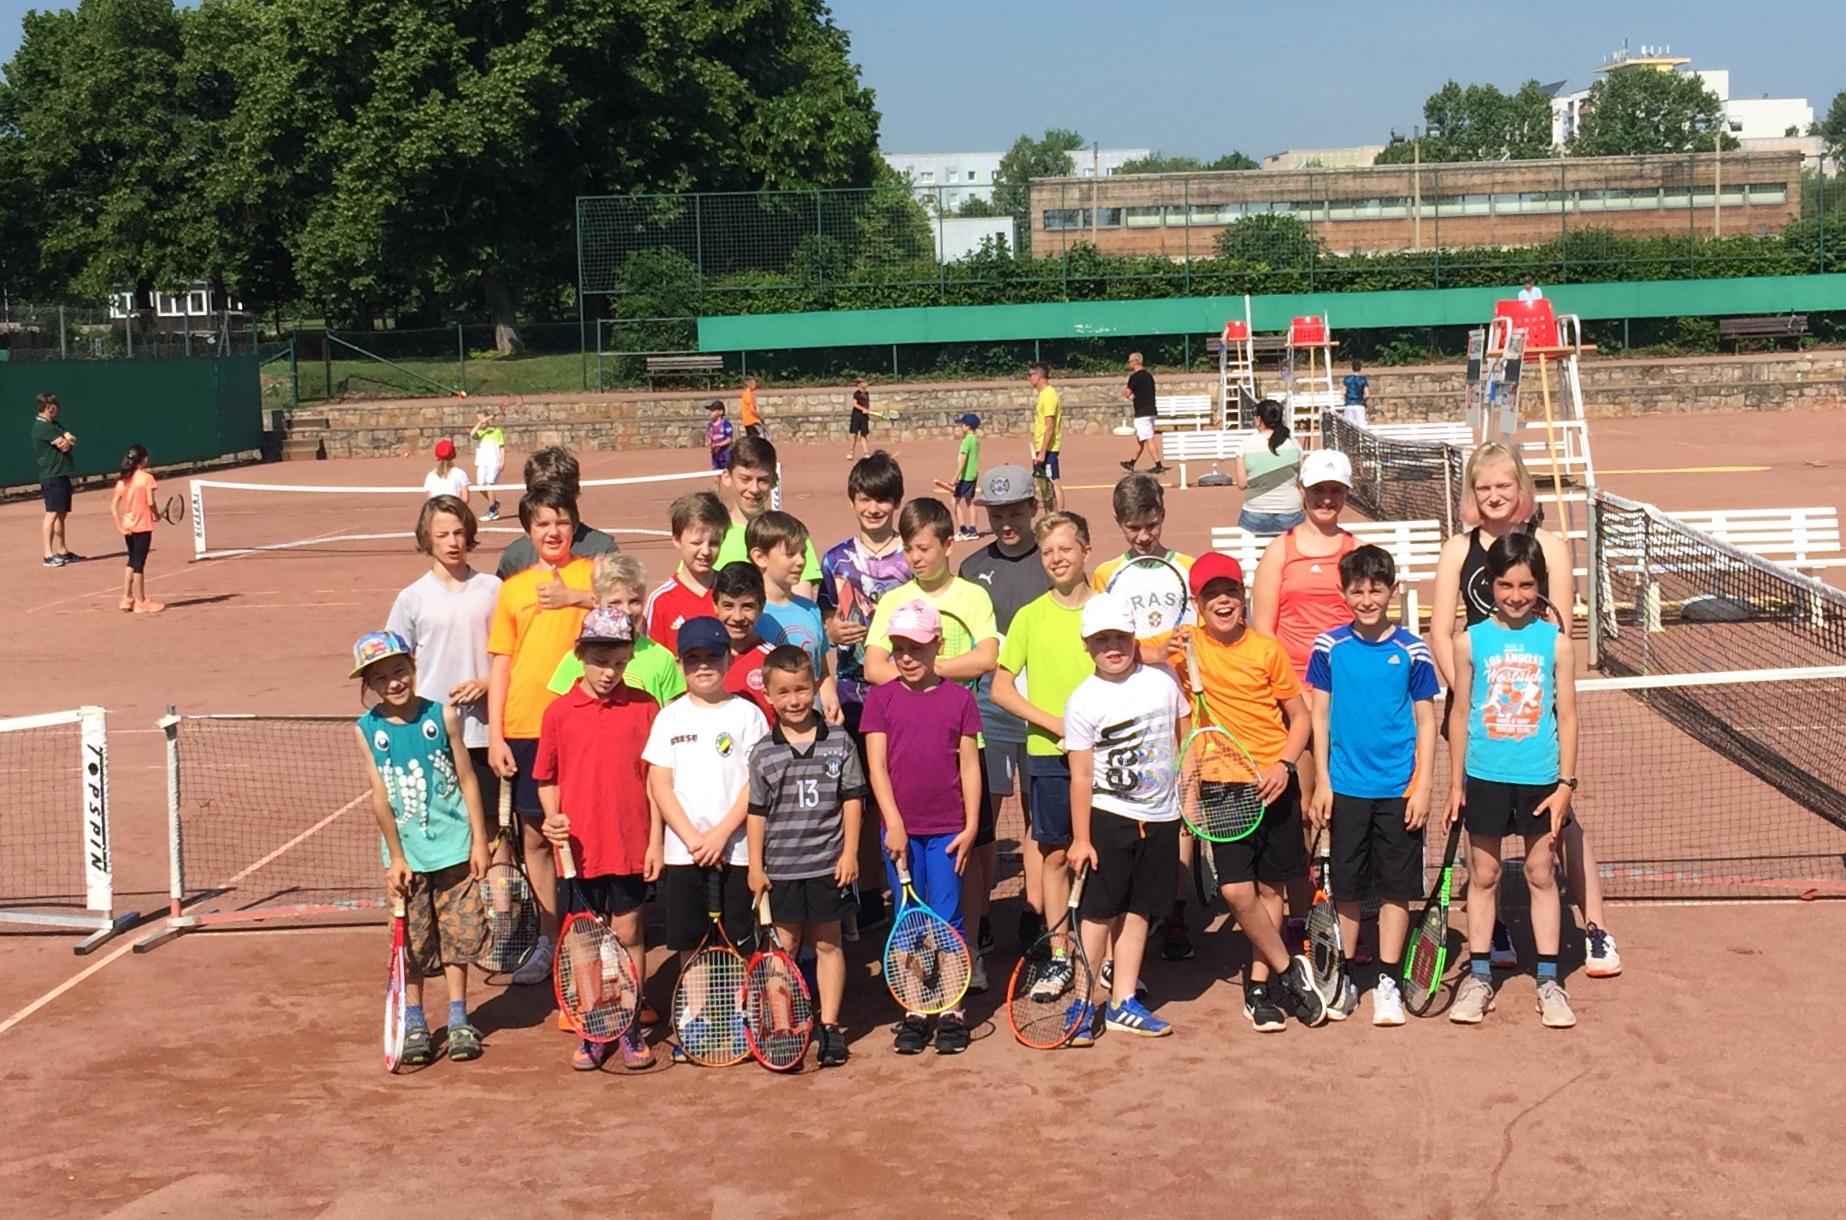 7. vereinsinternes Kinder- und Jugendturnier 2018 des Tennis-Clubs Weimar 1912 e.V.